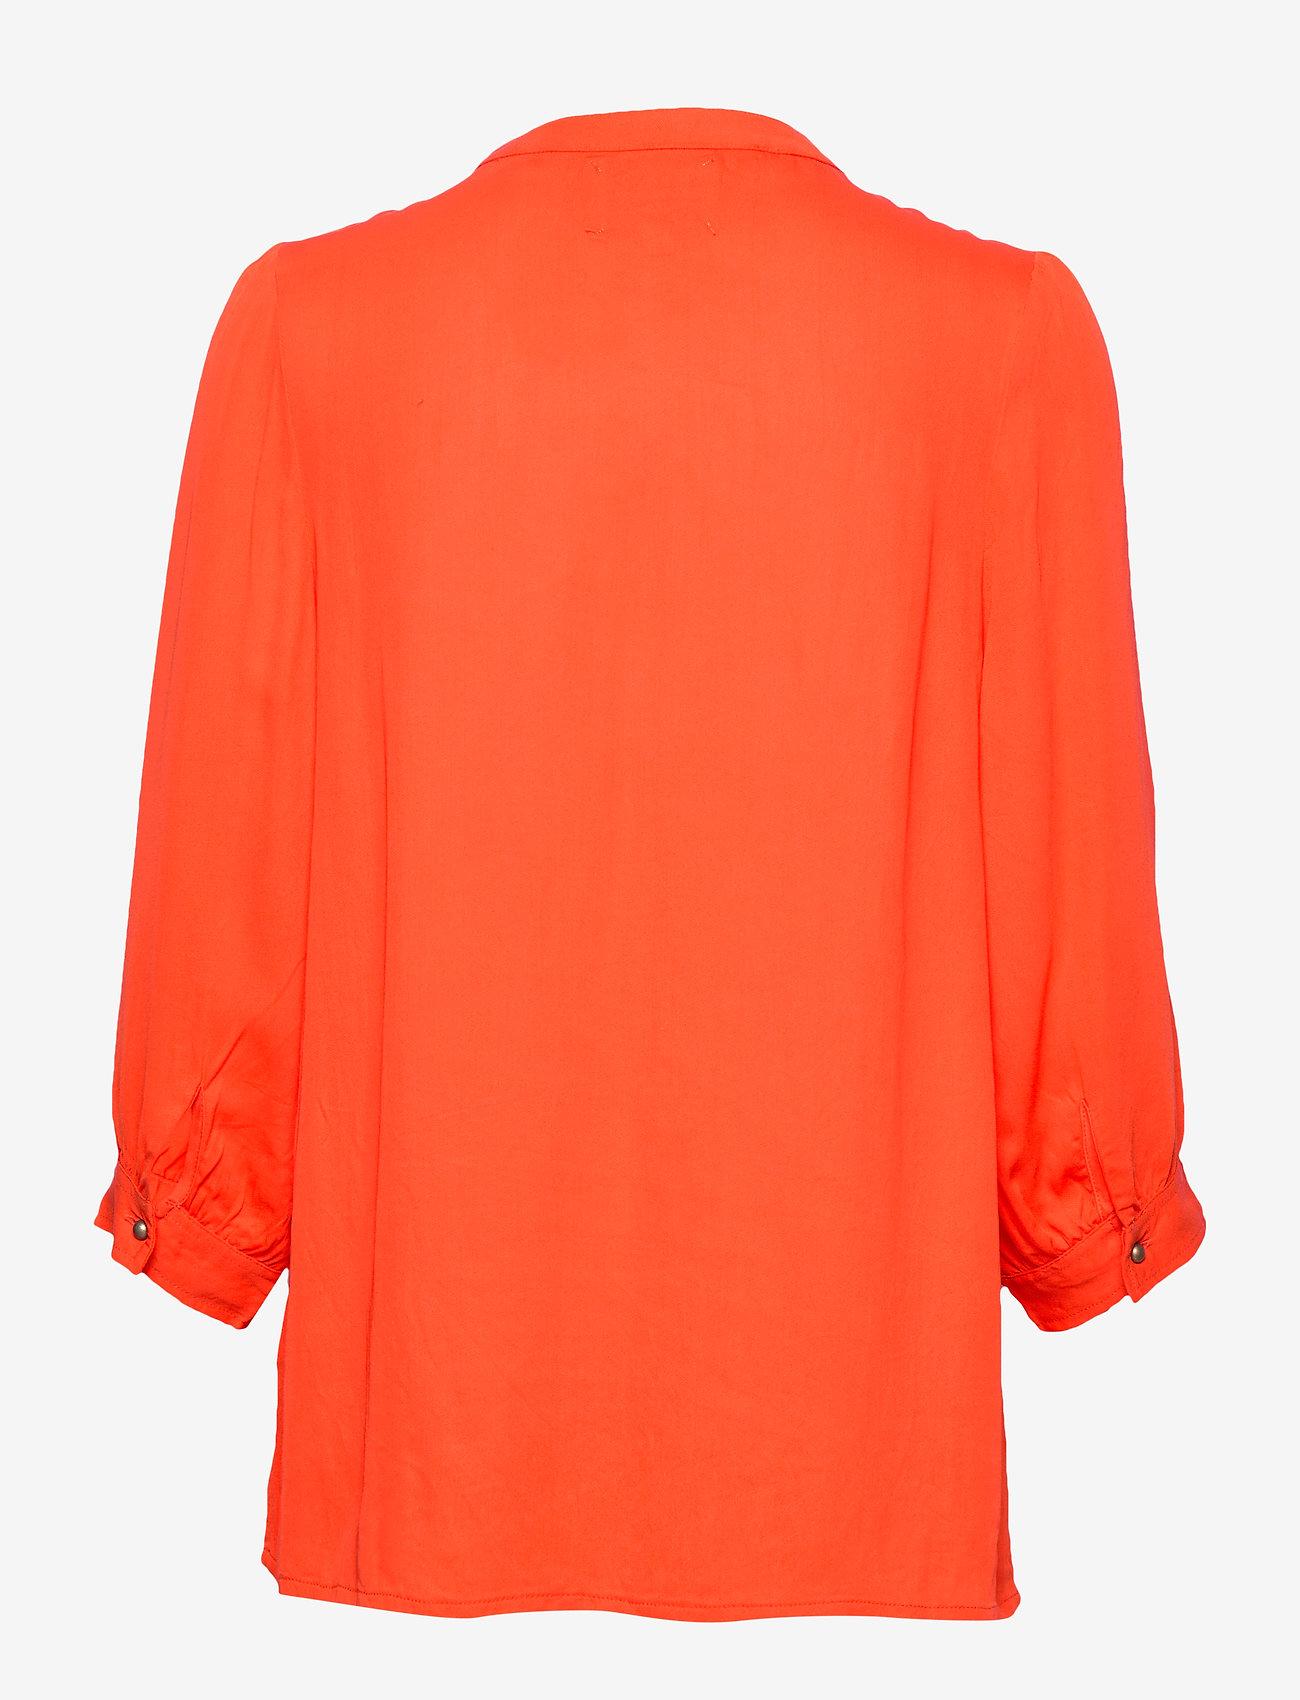 Amalie Shirt (Orange) (567 kr) - Lollys Laundry